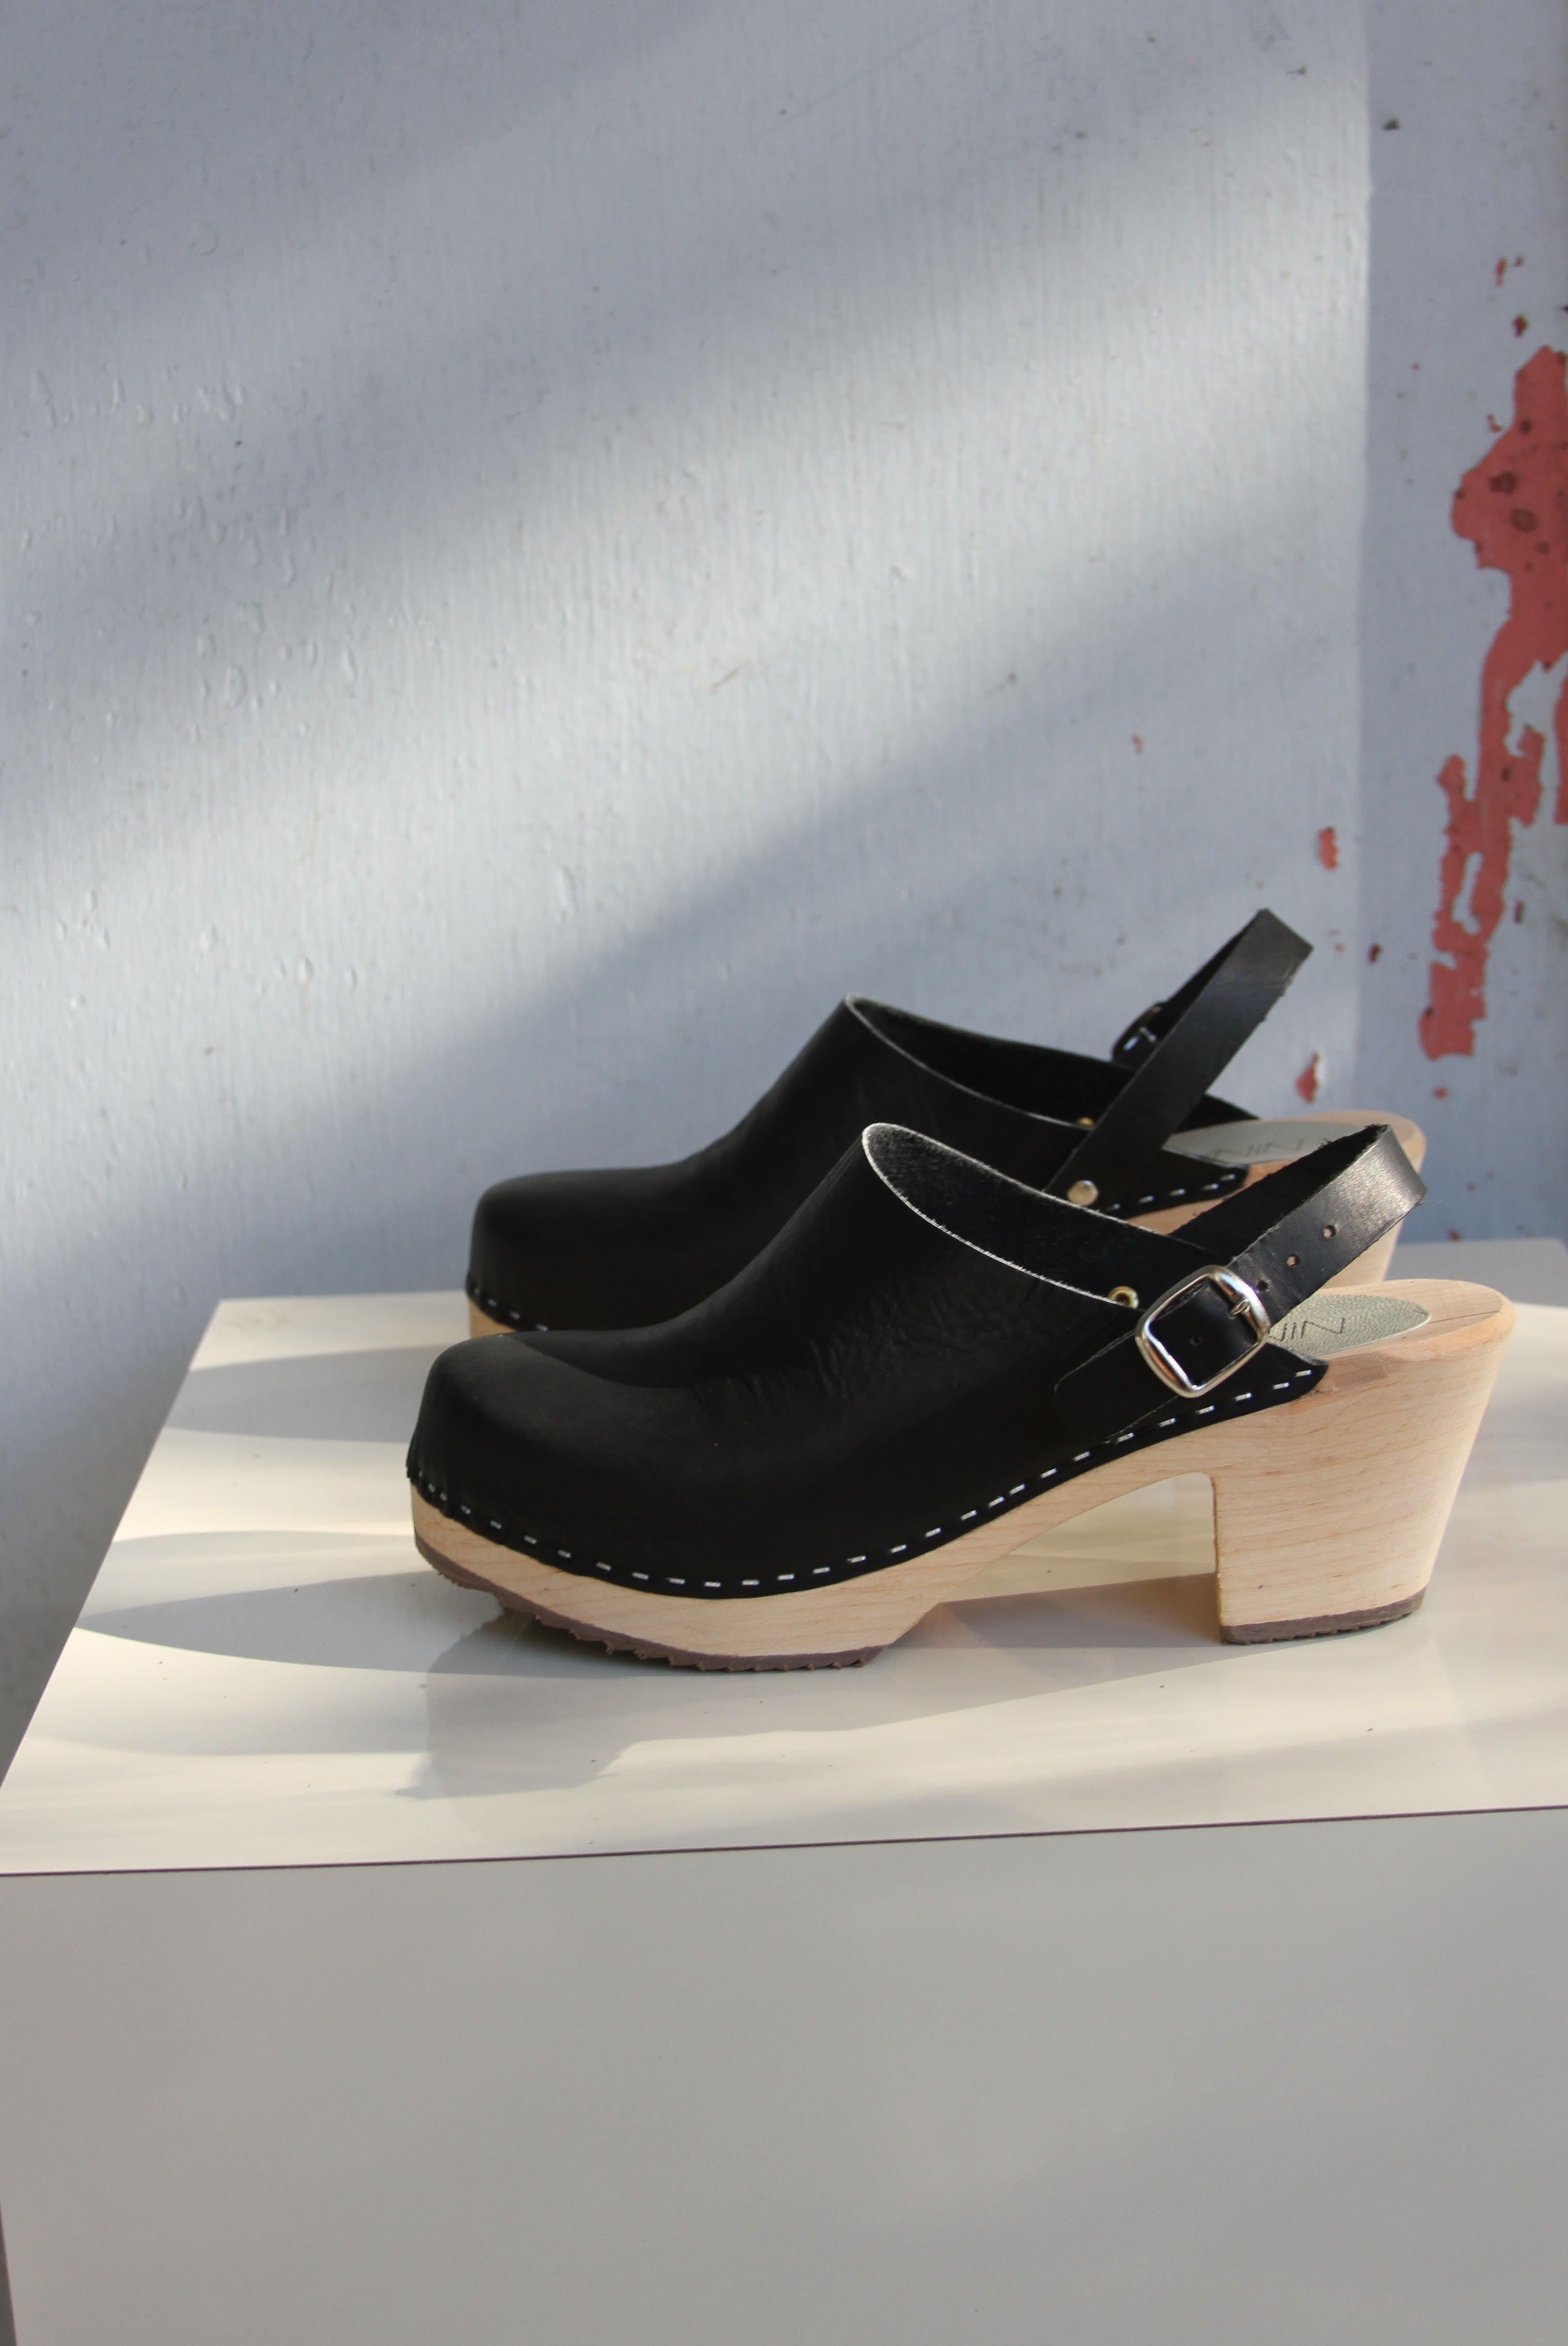 7cf8ced2d140 Nina Z Clogs Clog Boots